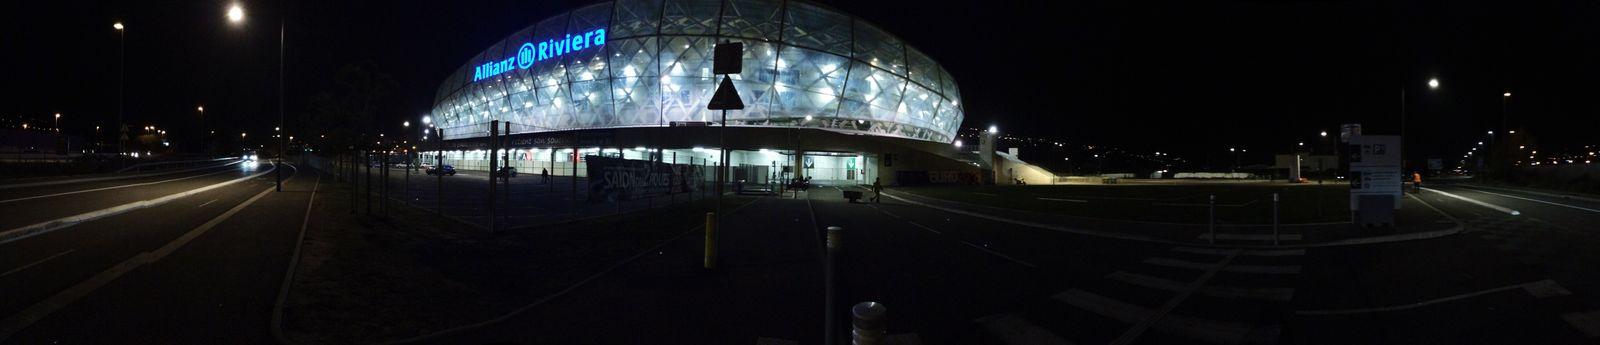 Nice Stadium Allianzriviera First Eyeem Photo